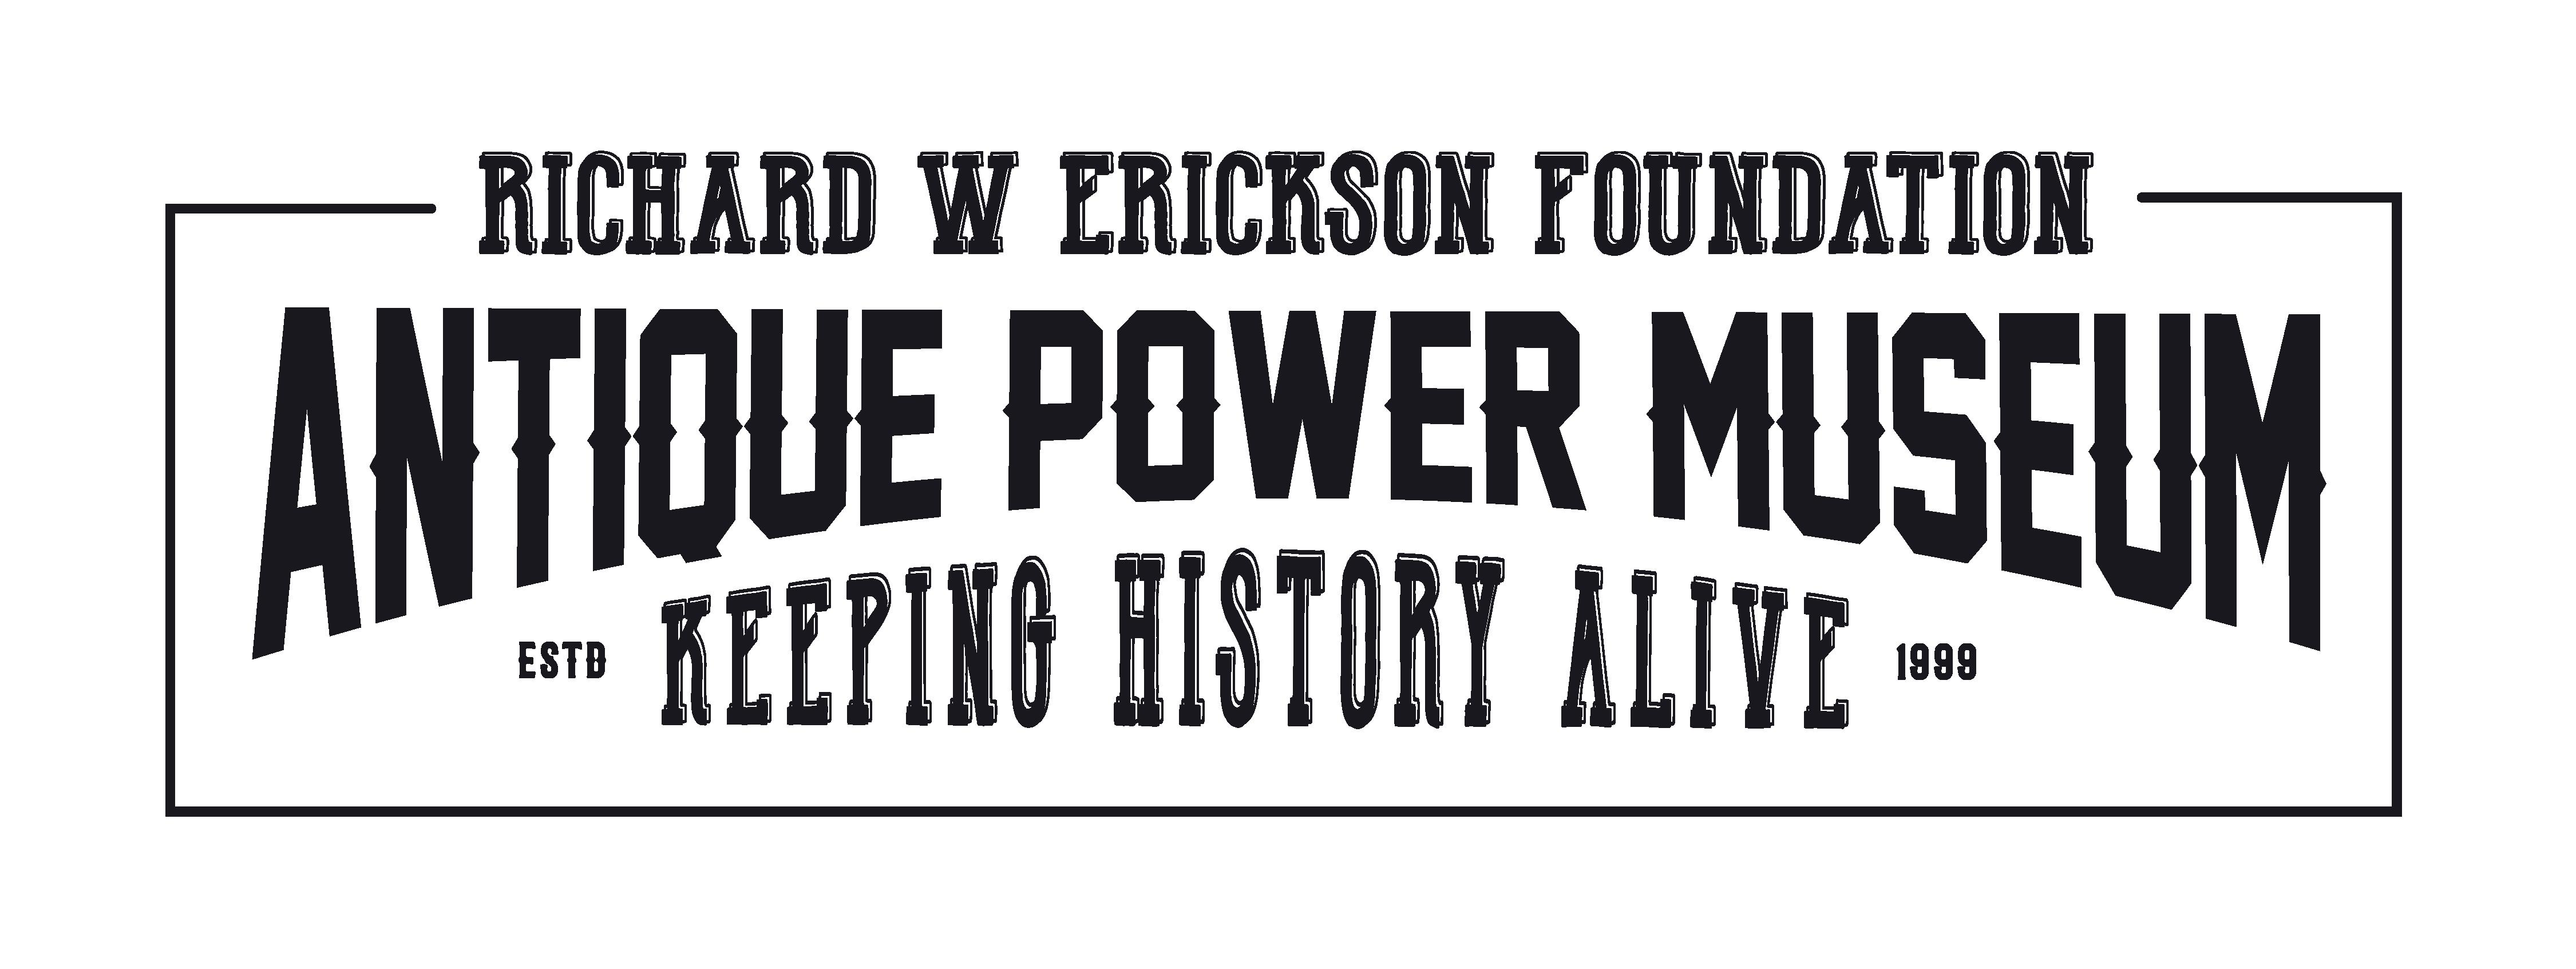 Richard Erickson Foundation